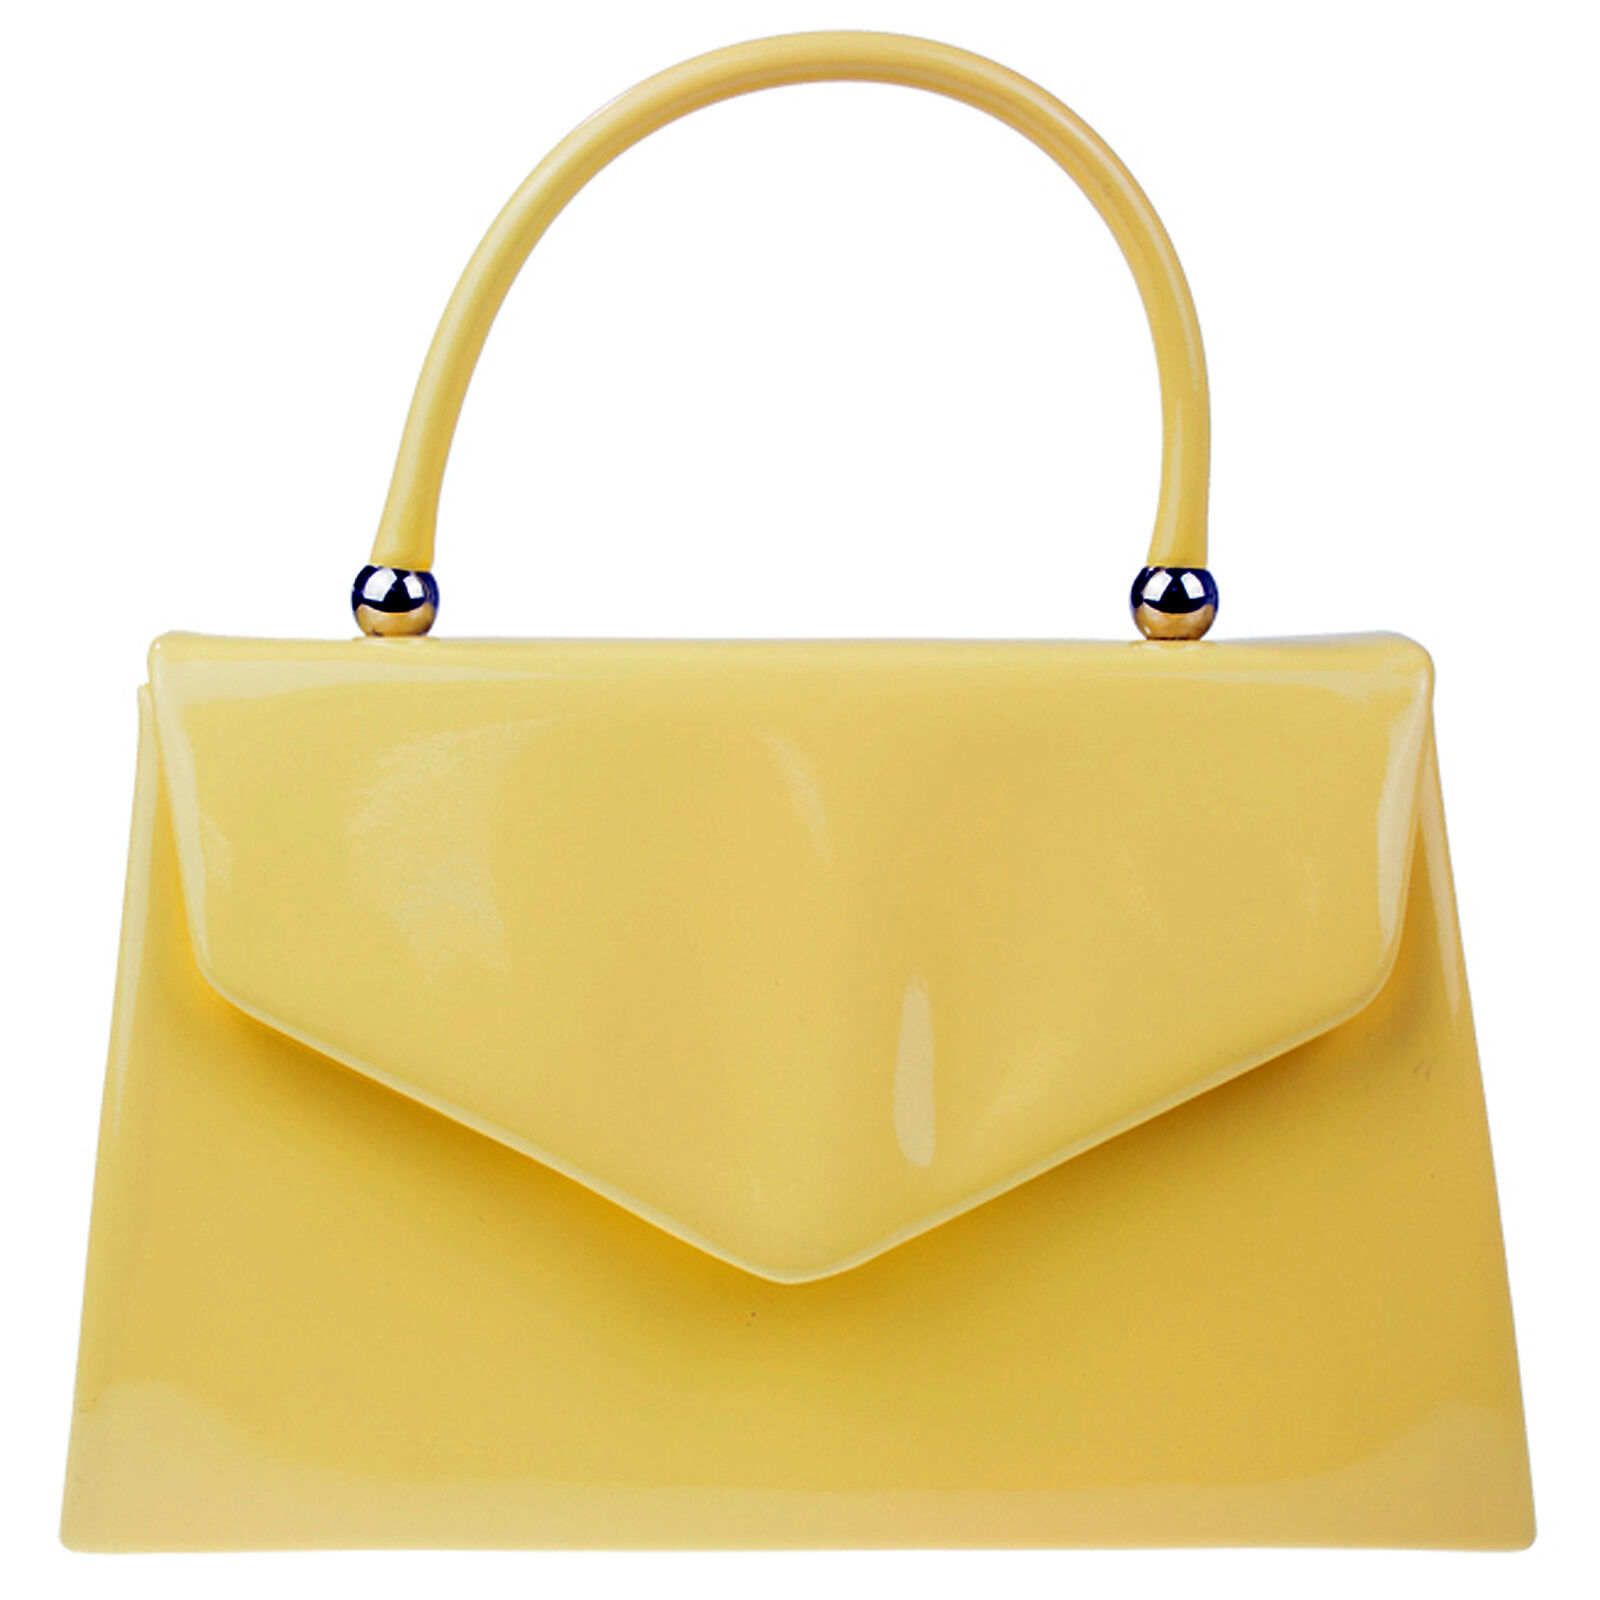 e6a92d4827c Fi9 Retro Tote Patent Leather Bridal Wedding Evening Handbag Party ...